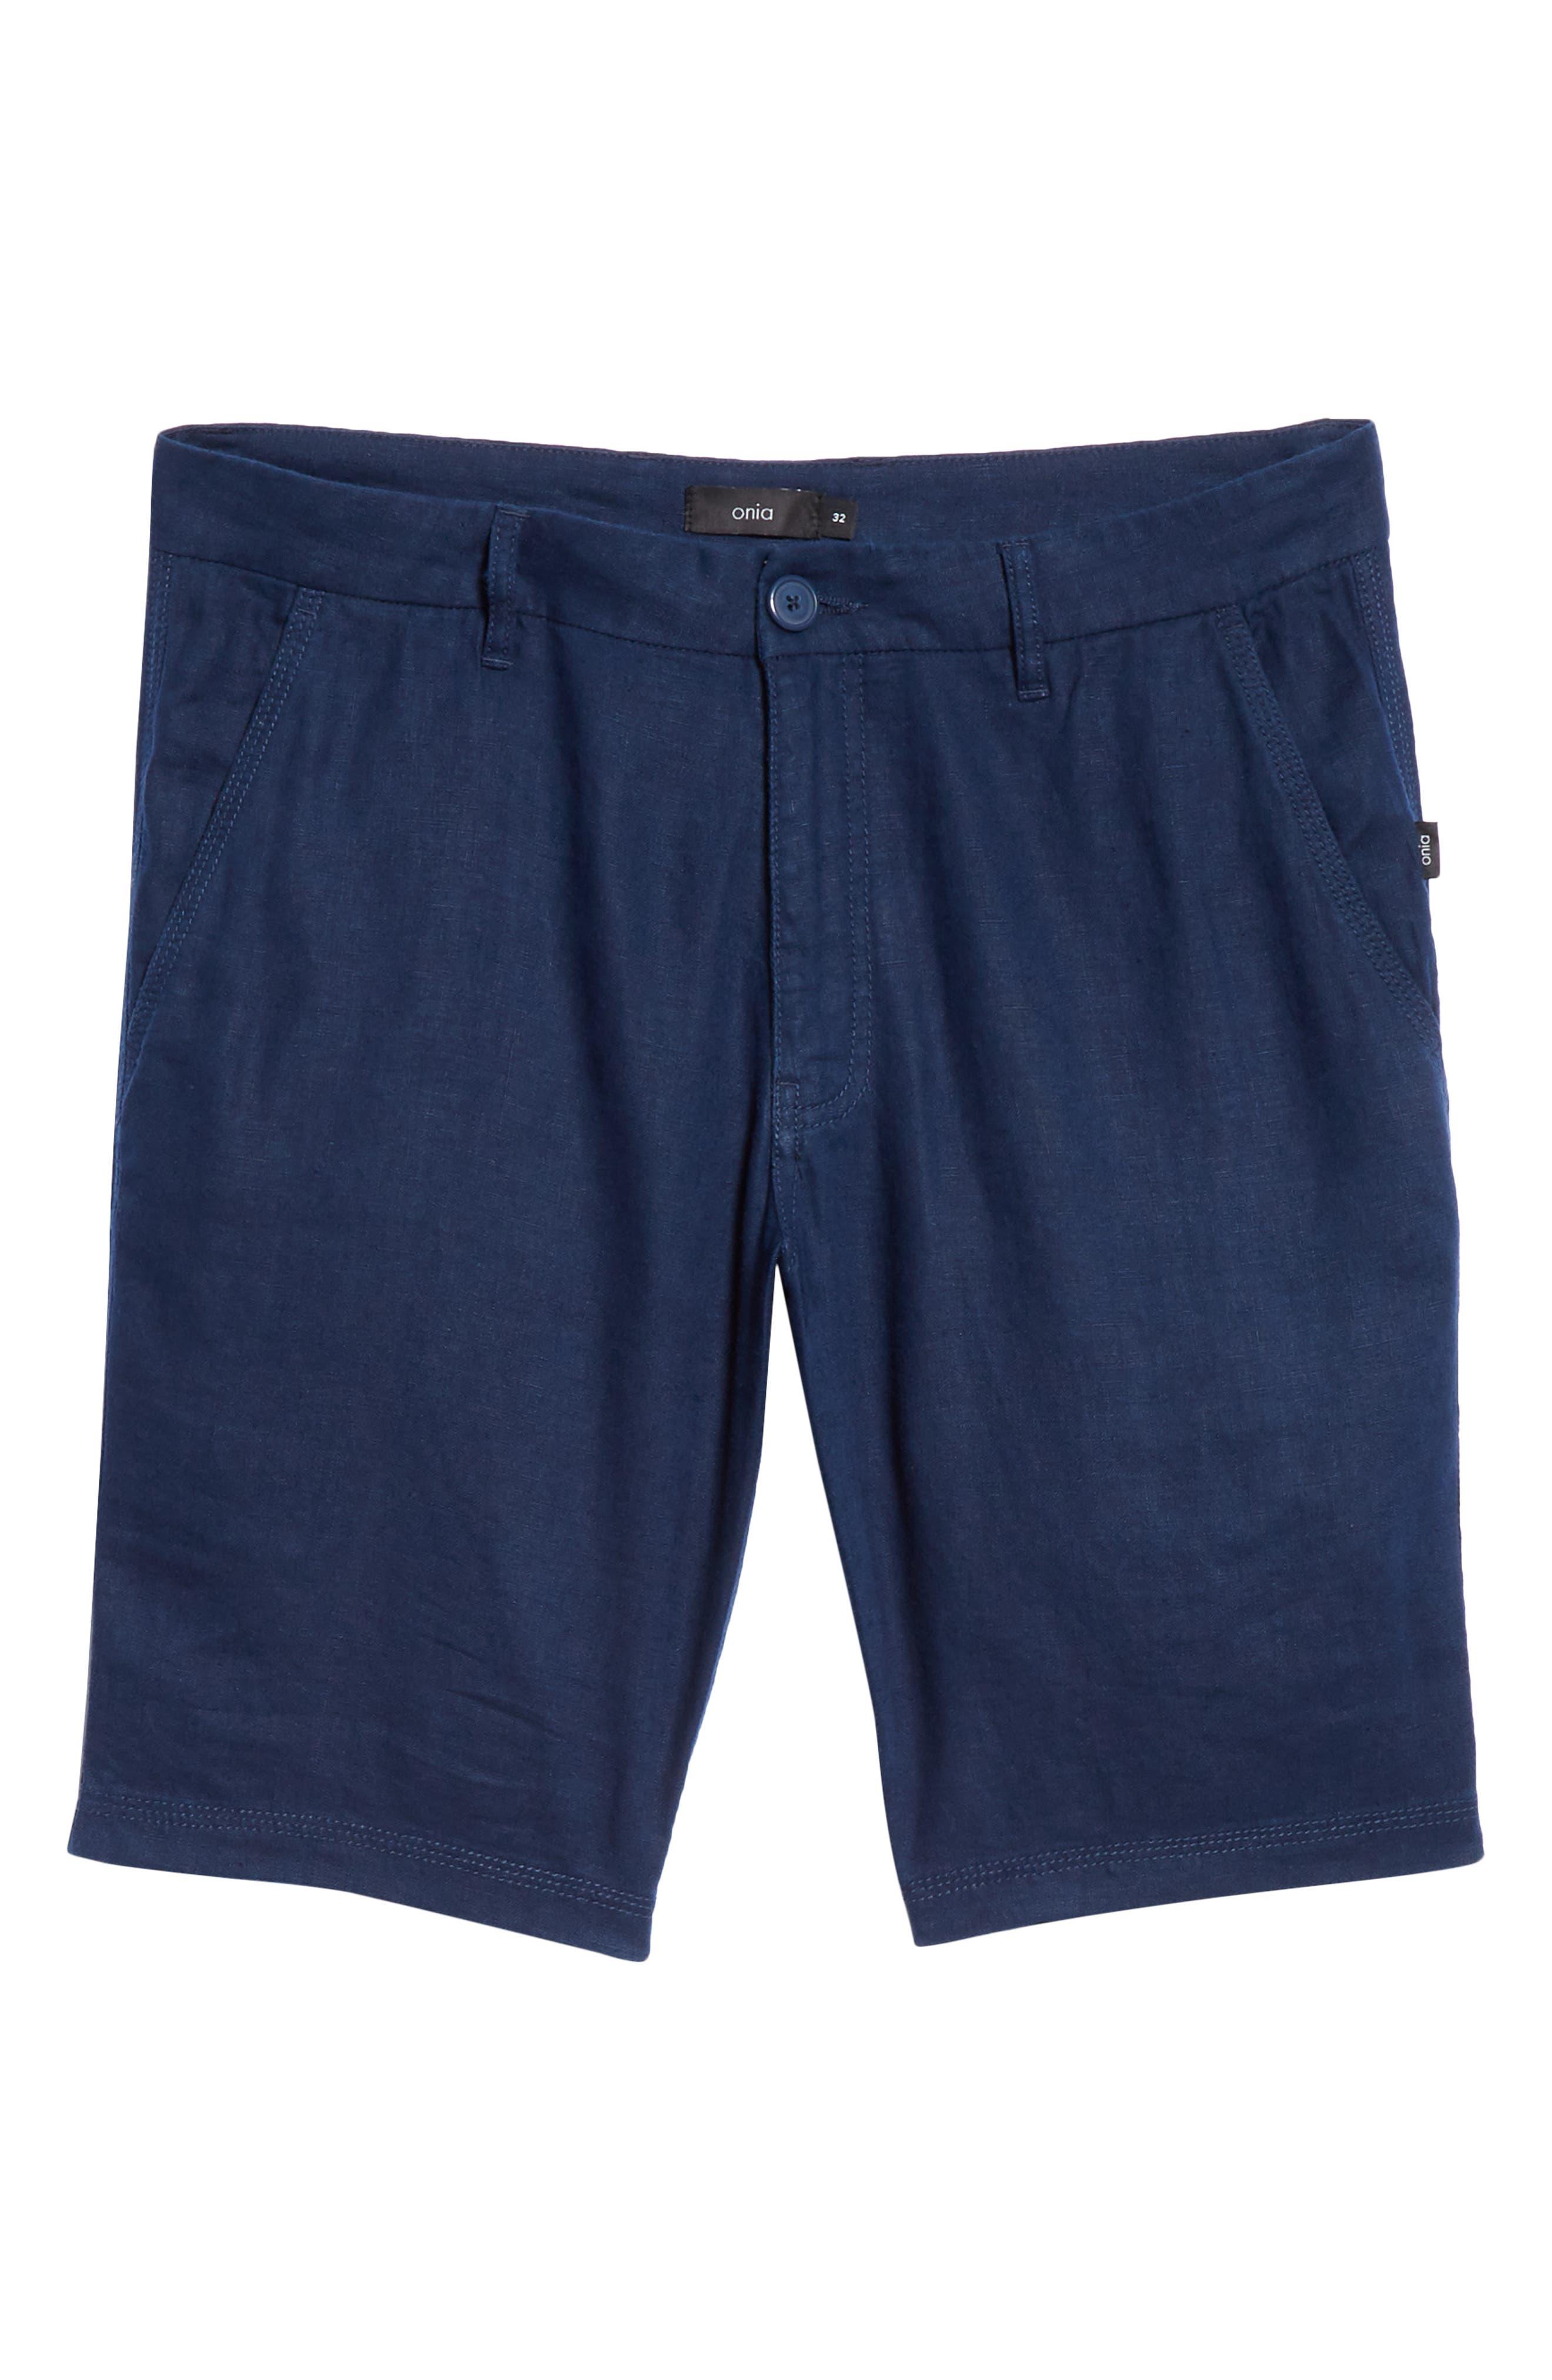 Austin Linen Shorts,                             Alternate thumbnail 6, color,                             DEEP NAVY